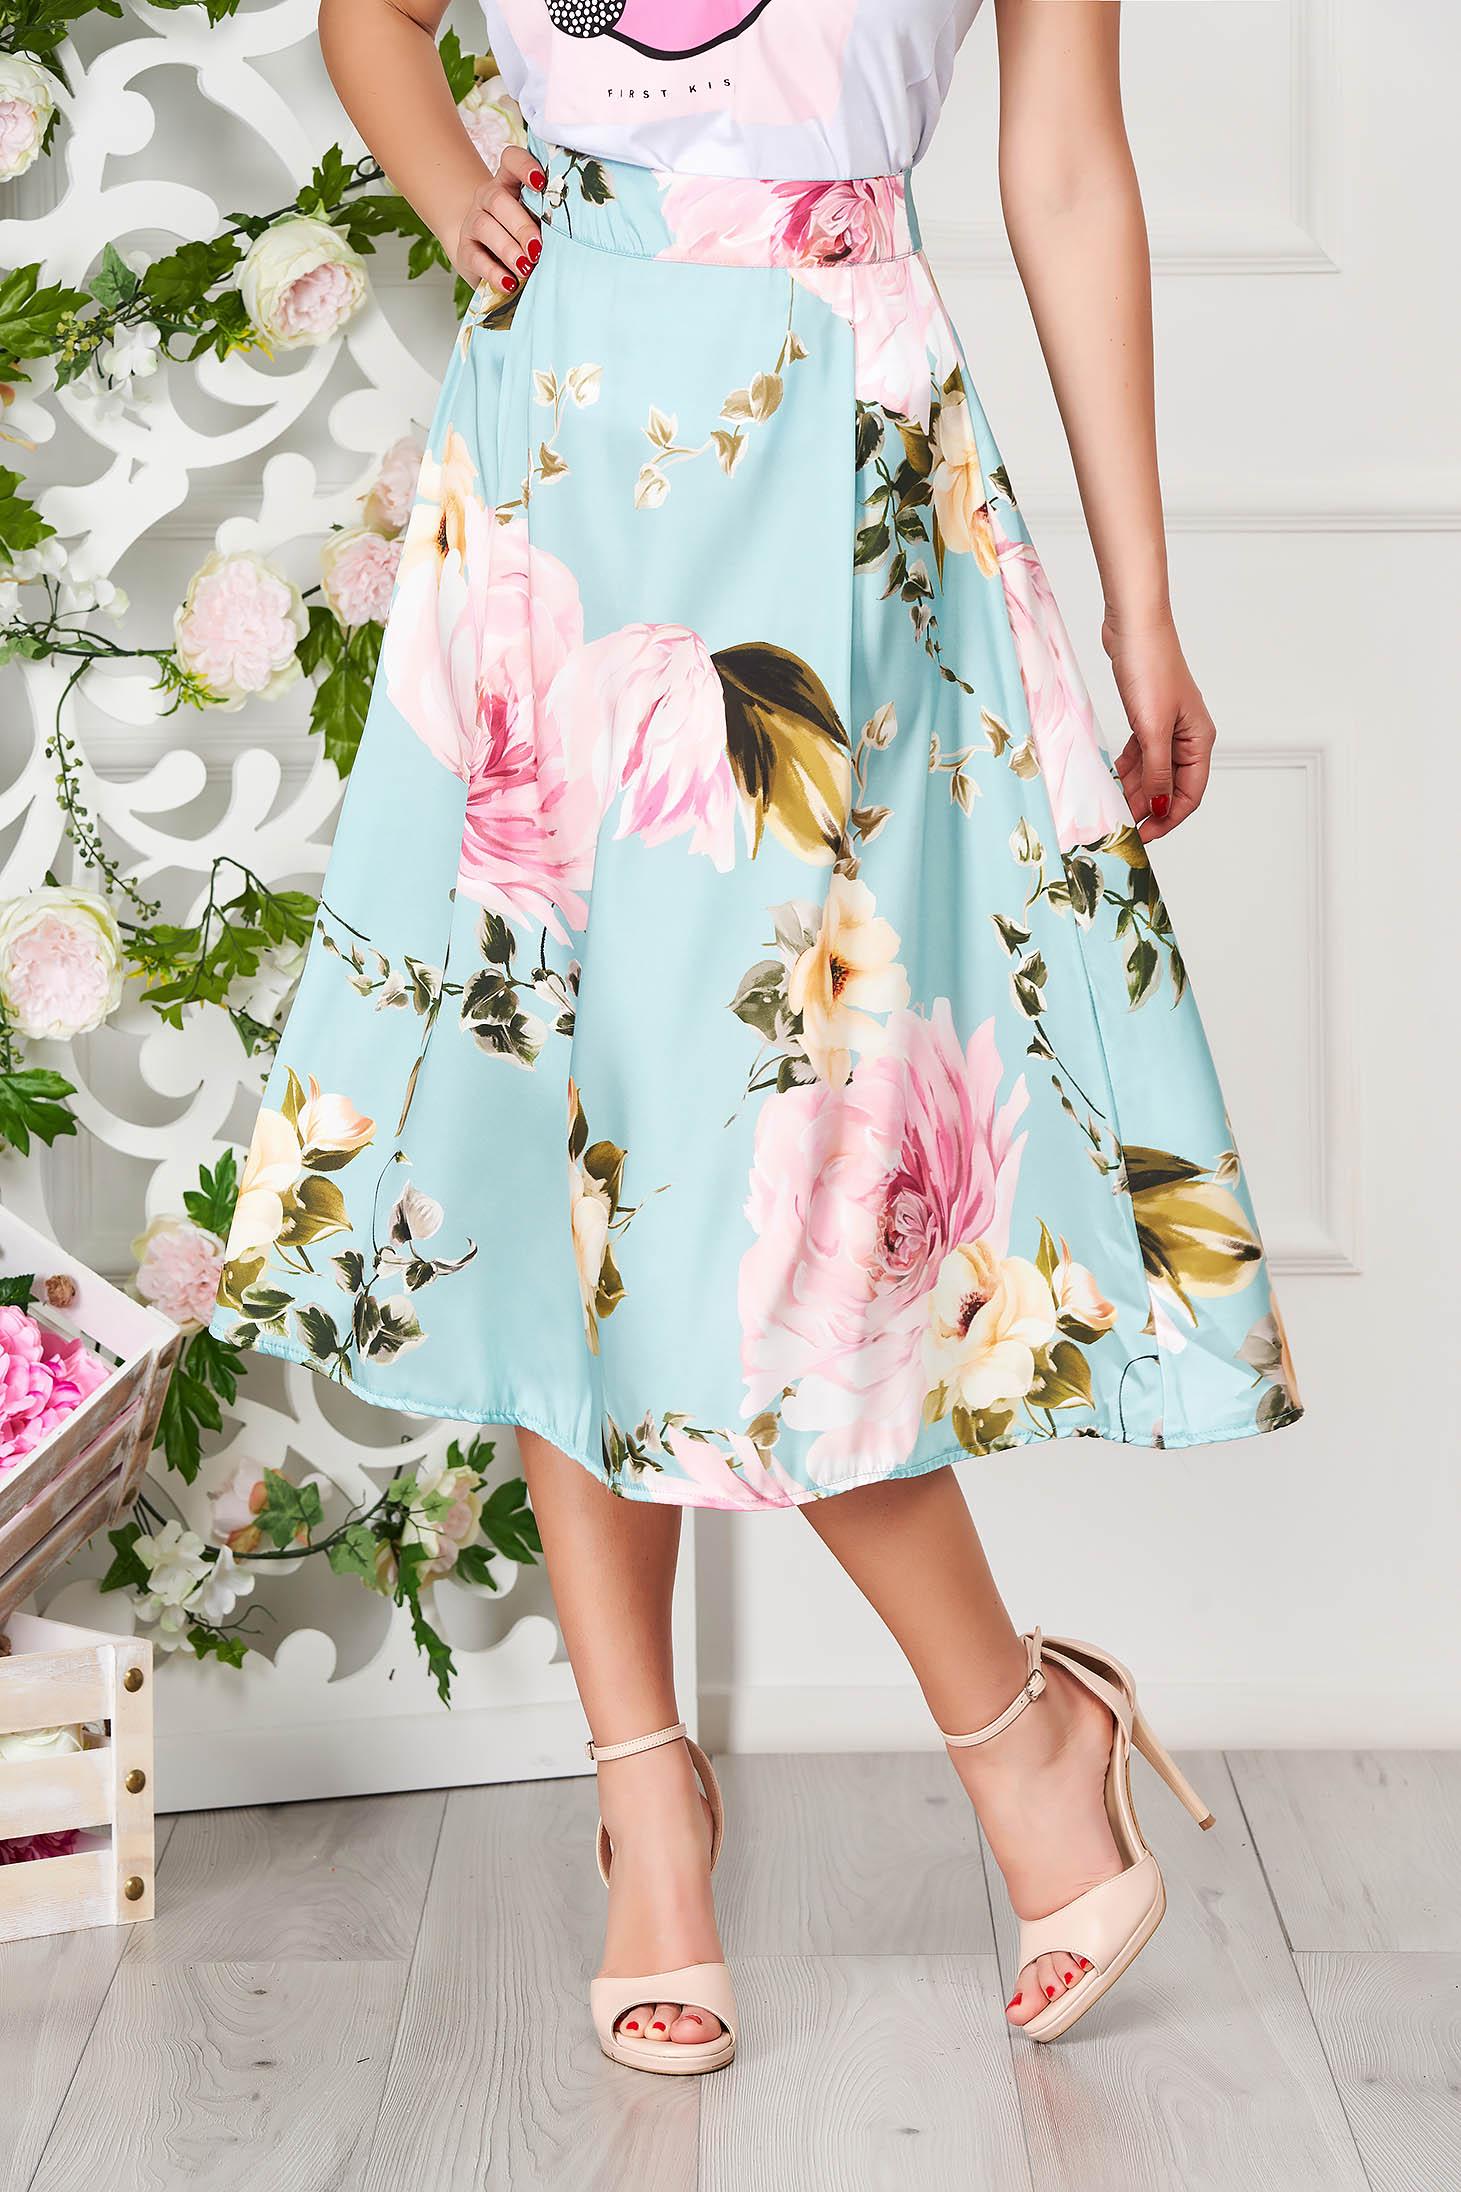 Fusta SunShine turcoaz eleganta midi in clos cu imprimeu floral